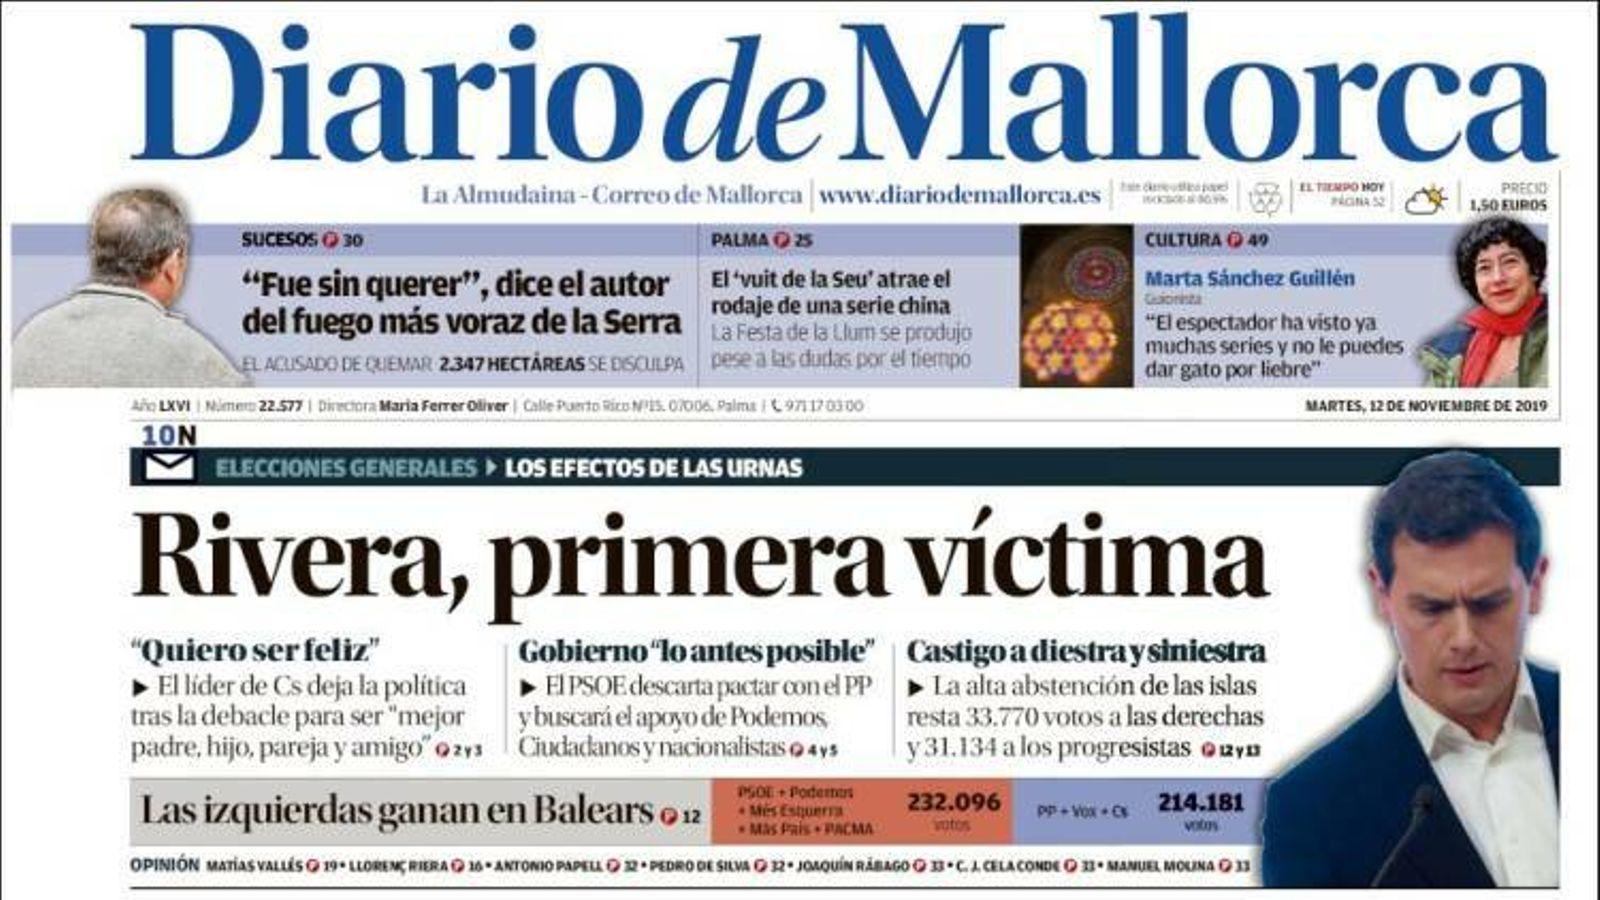 """Rivera, primera víctima"", a la portada de 'Diario de Mallorca'"